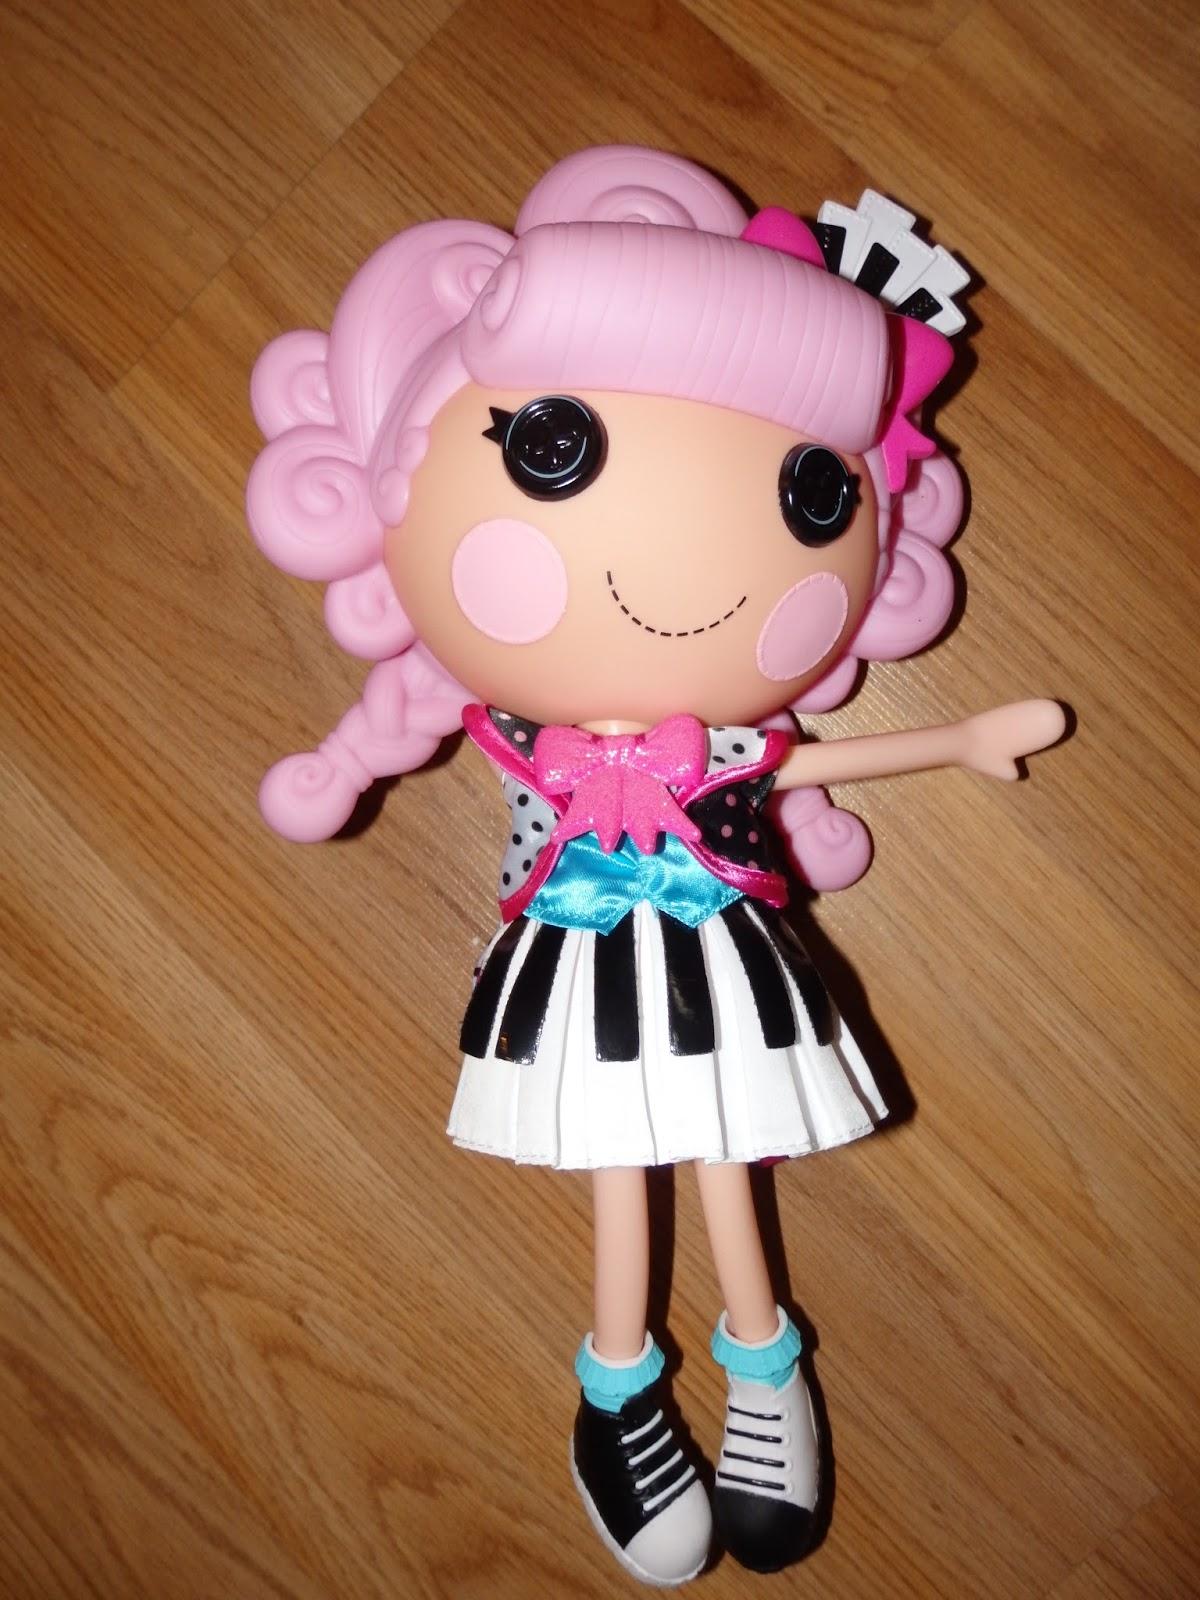 Key Sharps N Flats Doll dress is really beautiful.